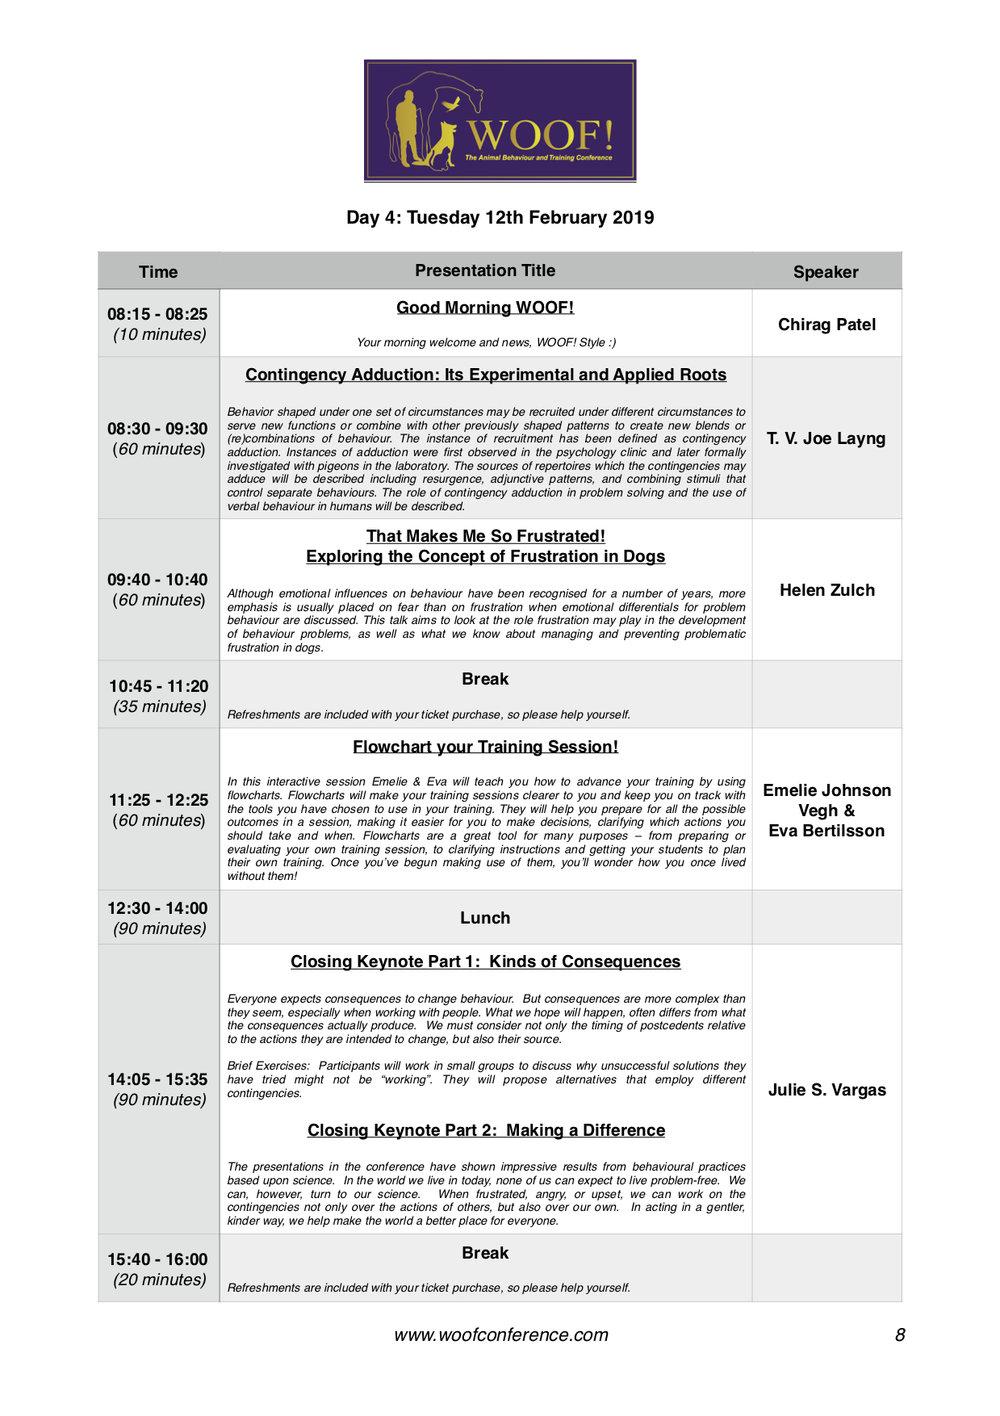 WOOF! 2019 Schedule Public 1.0 Page 8.jpg